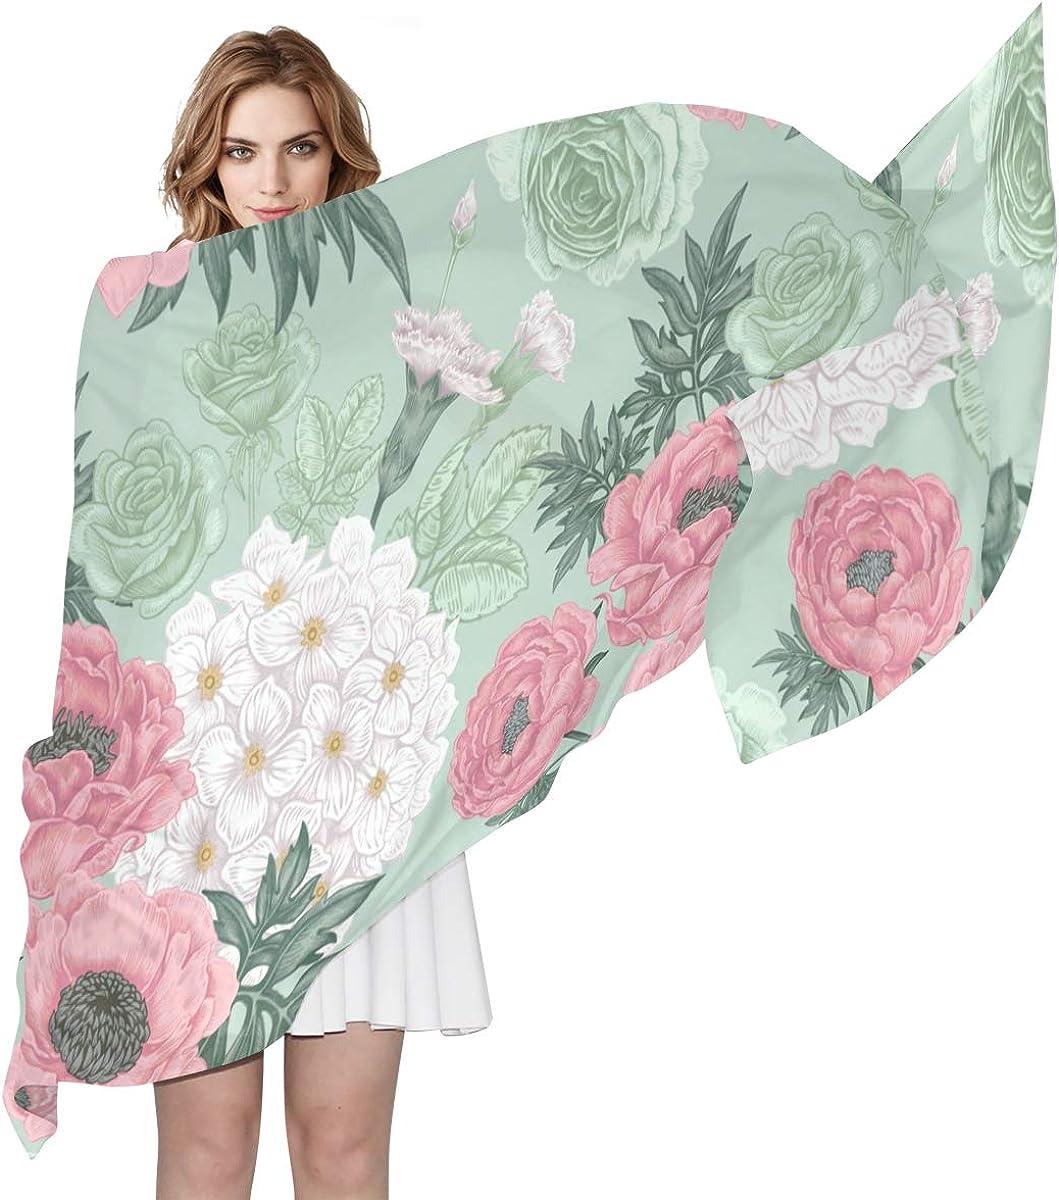 EELa Long Shawl for Women Roses Peonies Hydrangeas Printed Wrap 70x35 inches